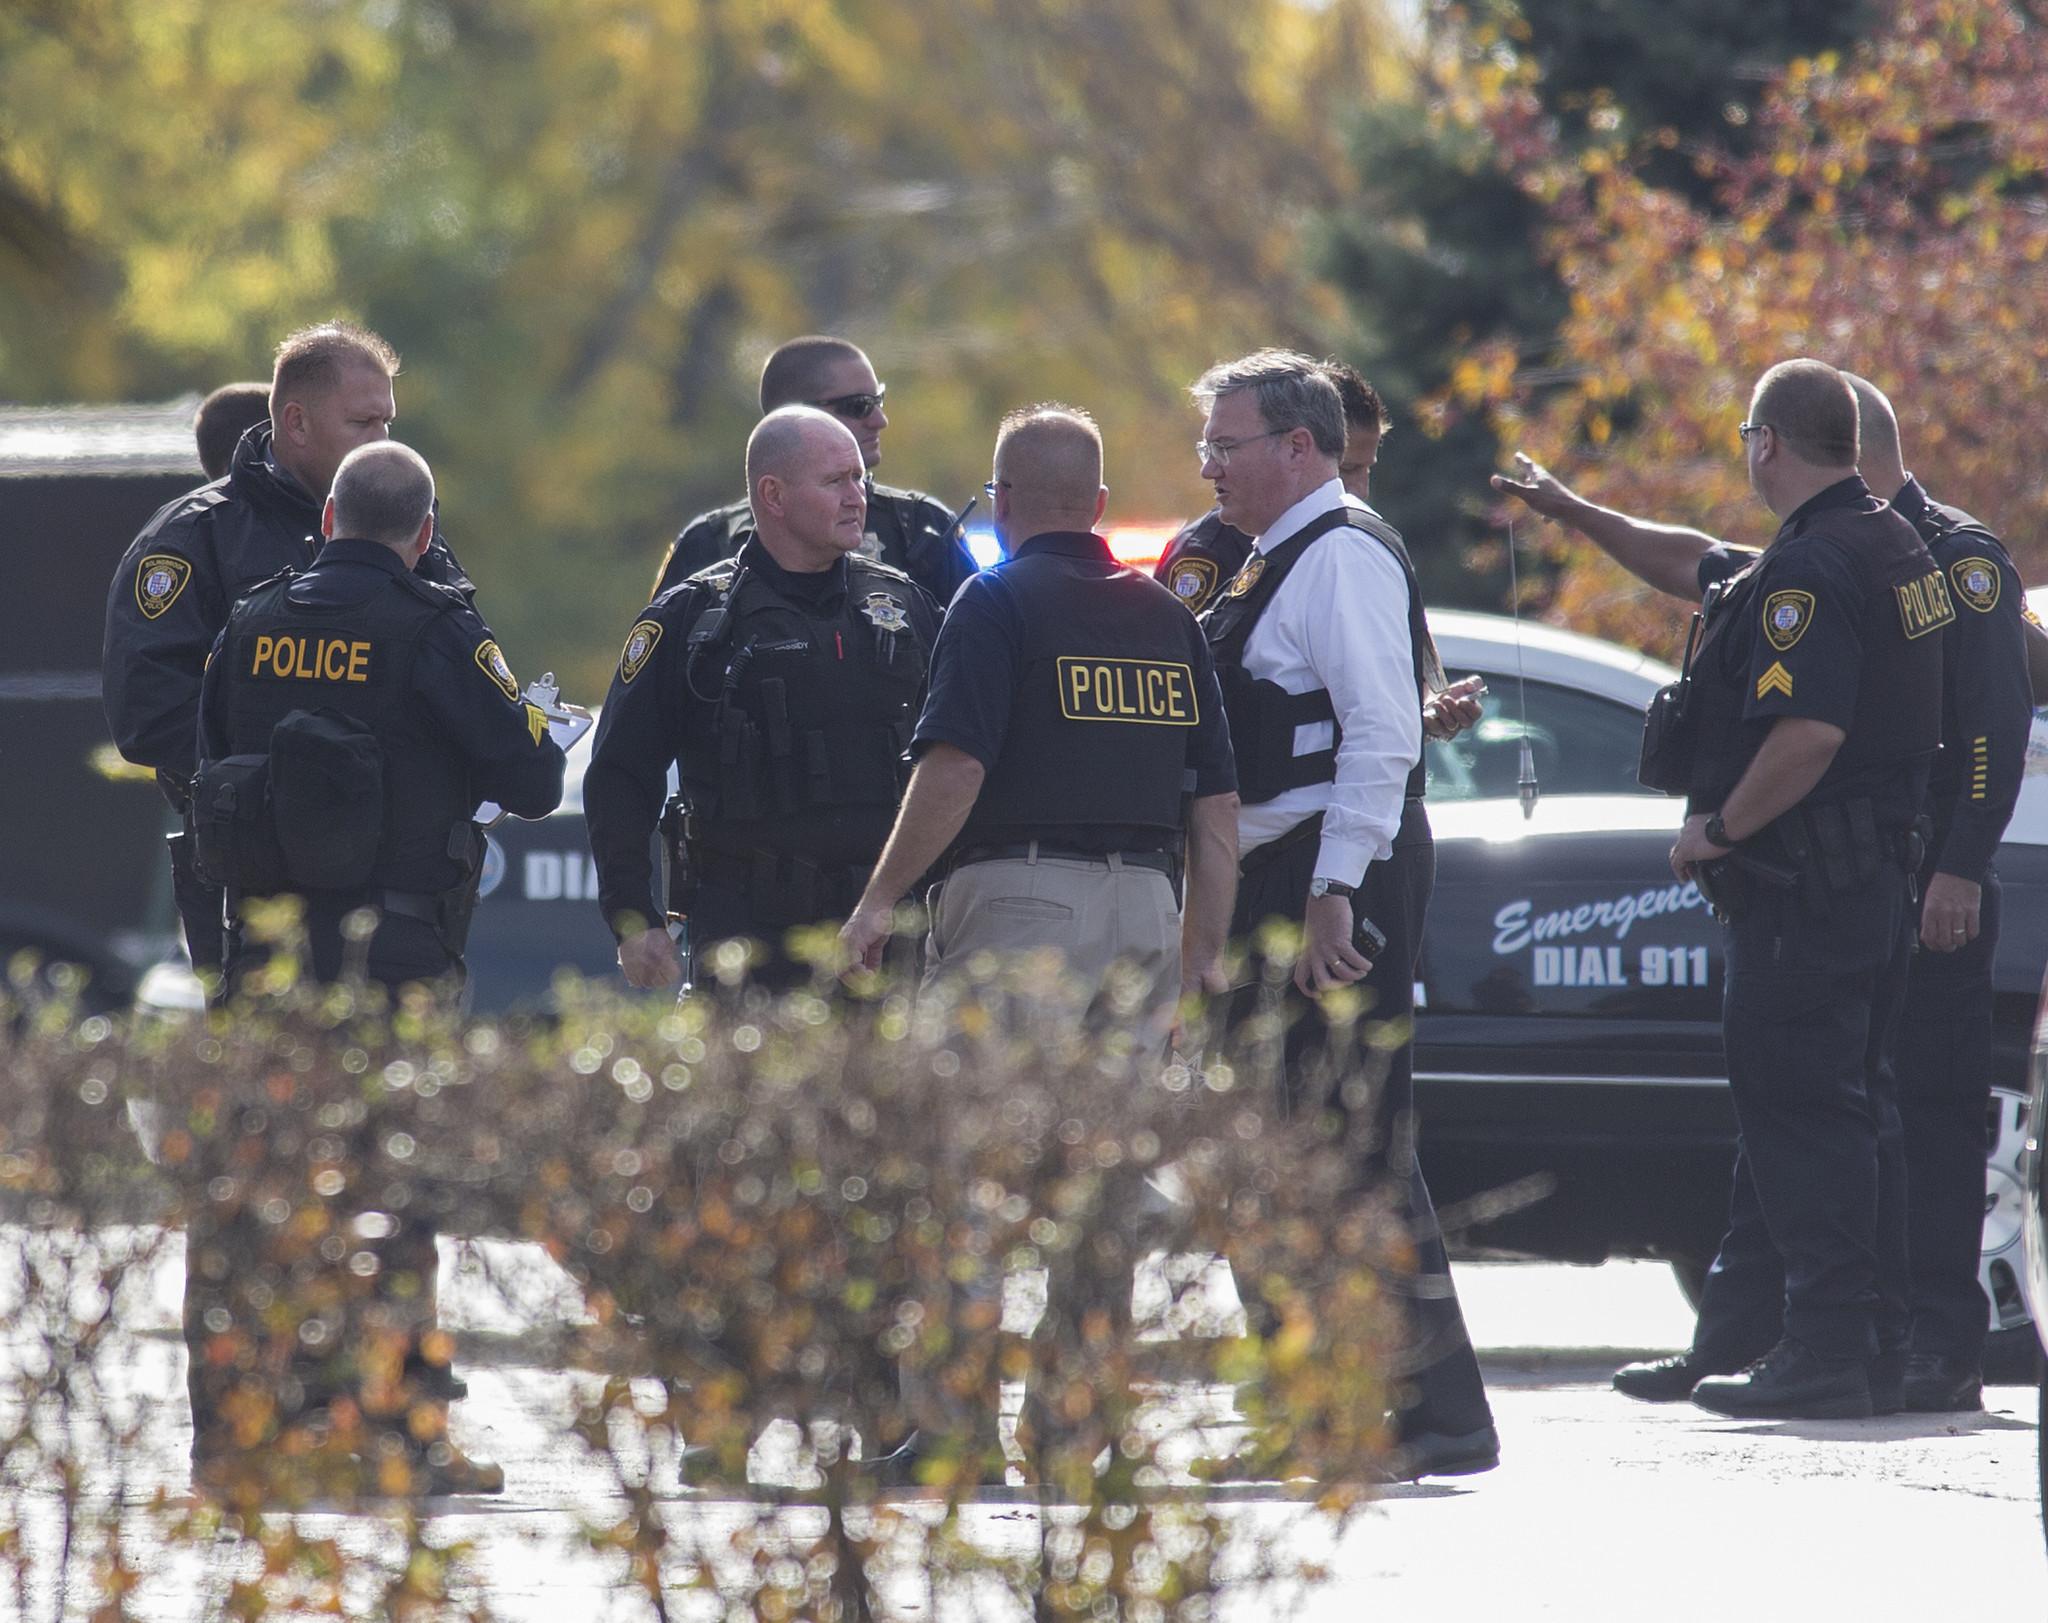 Illinois will county university park - Neighbors Saw Nothing Amiss Before Bolingbrook Shooting